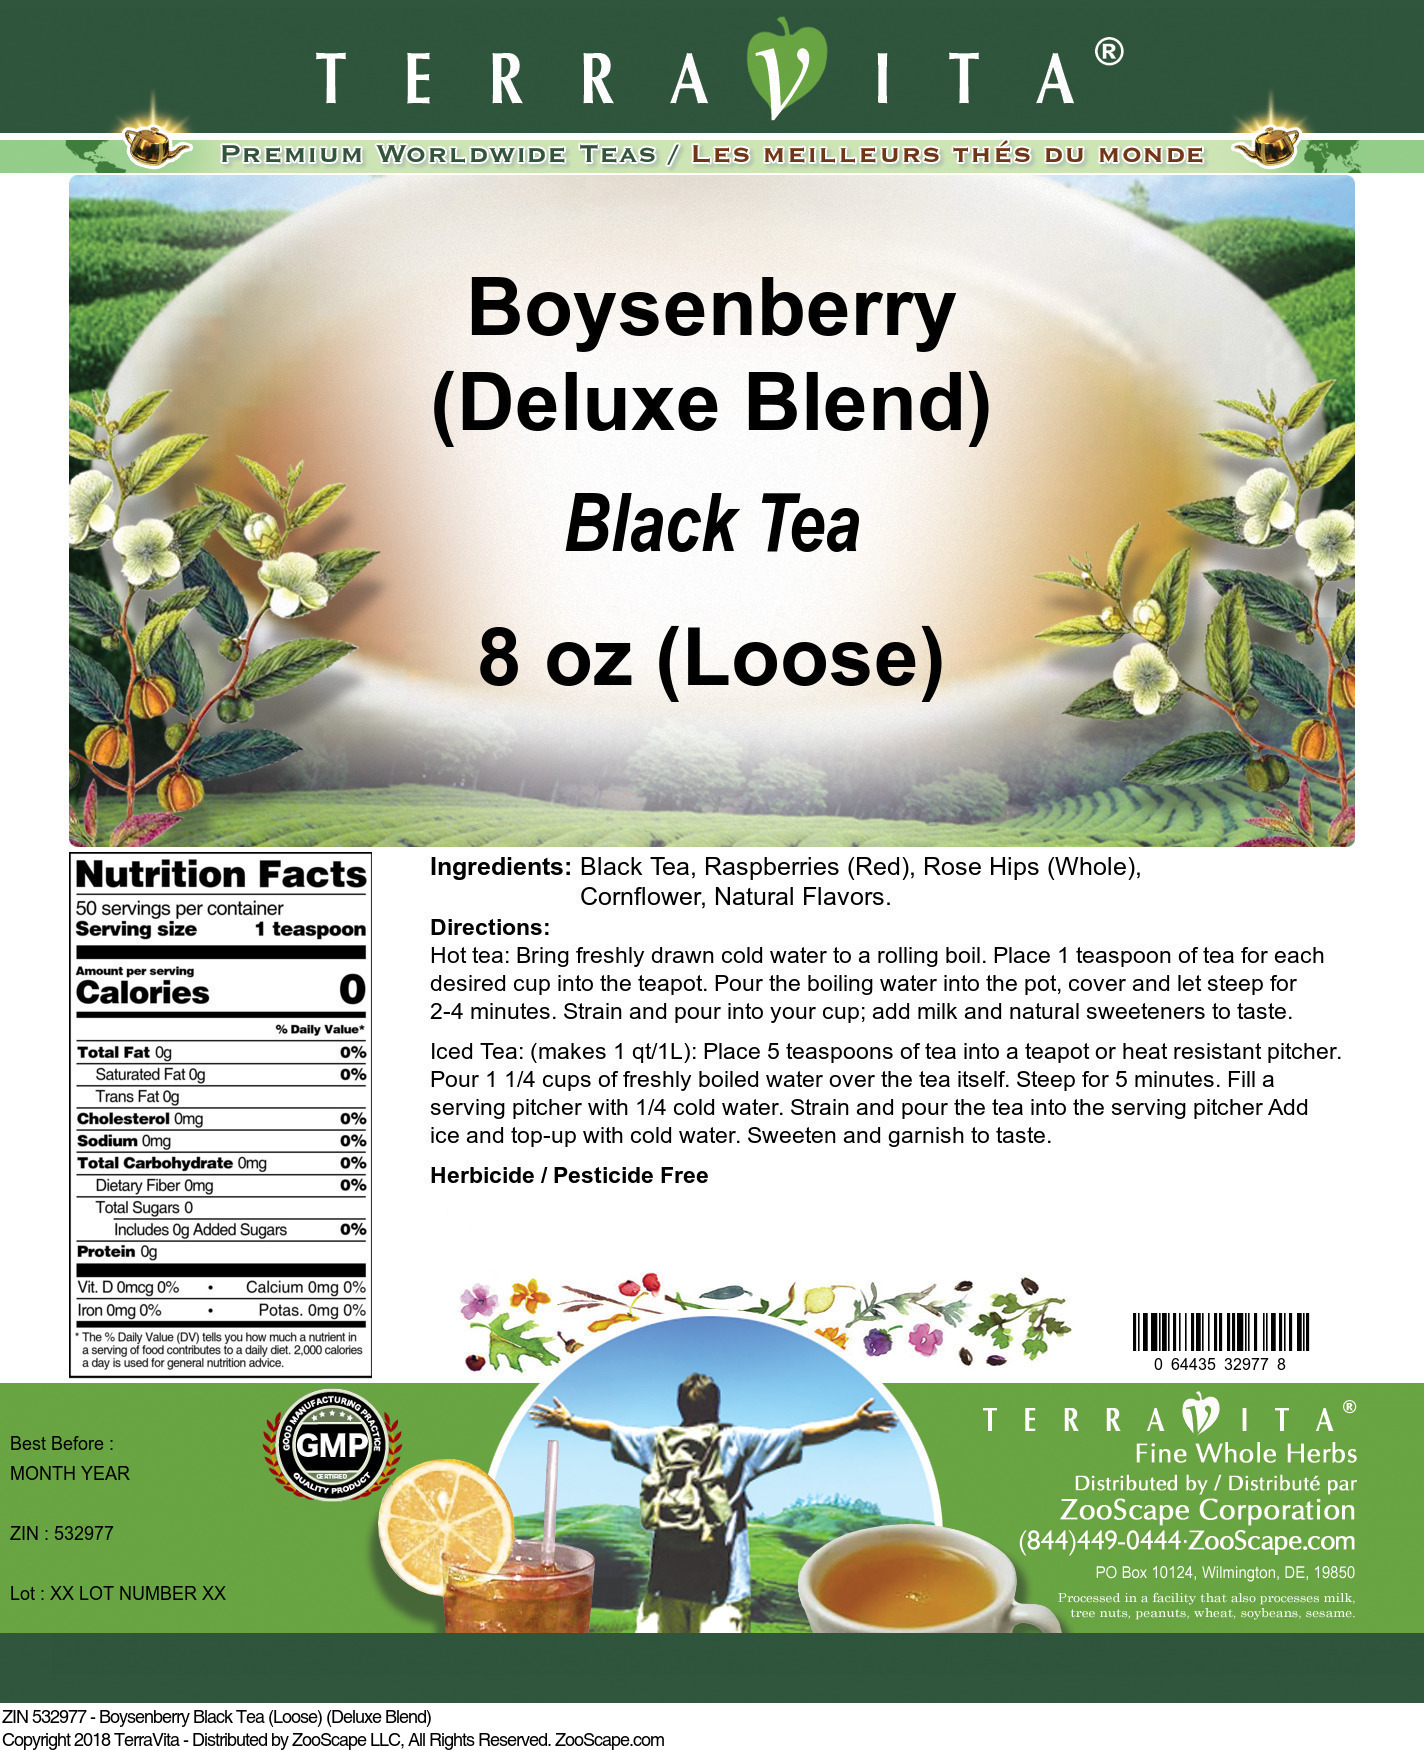 Boysenberry Black Tea (Loose) (Deluxe Blend)